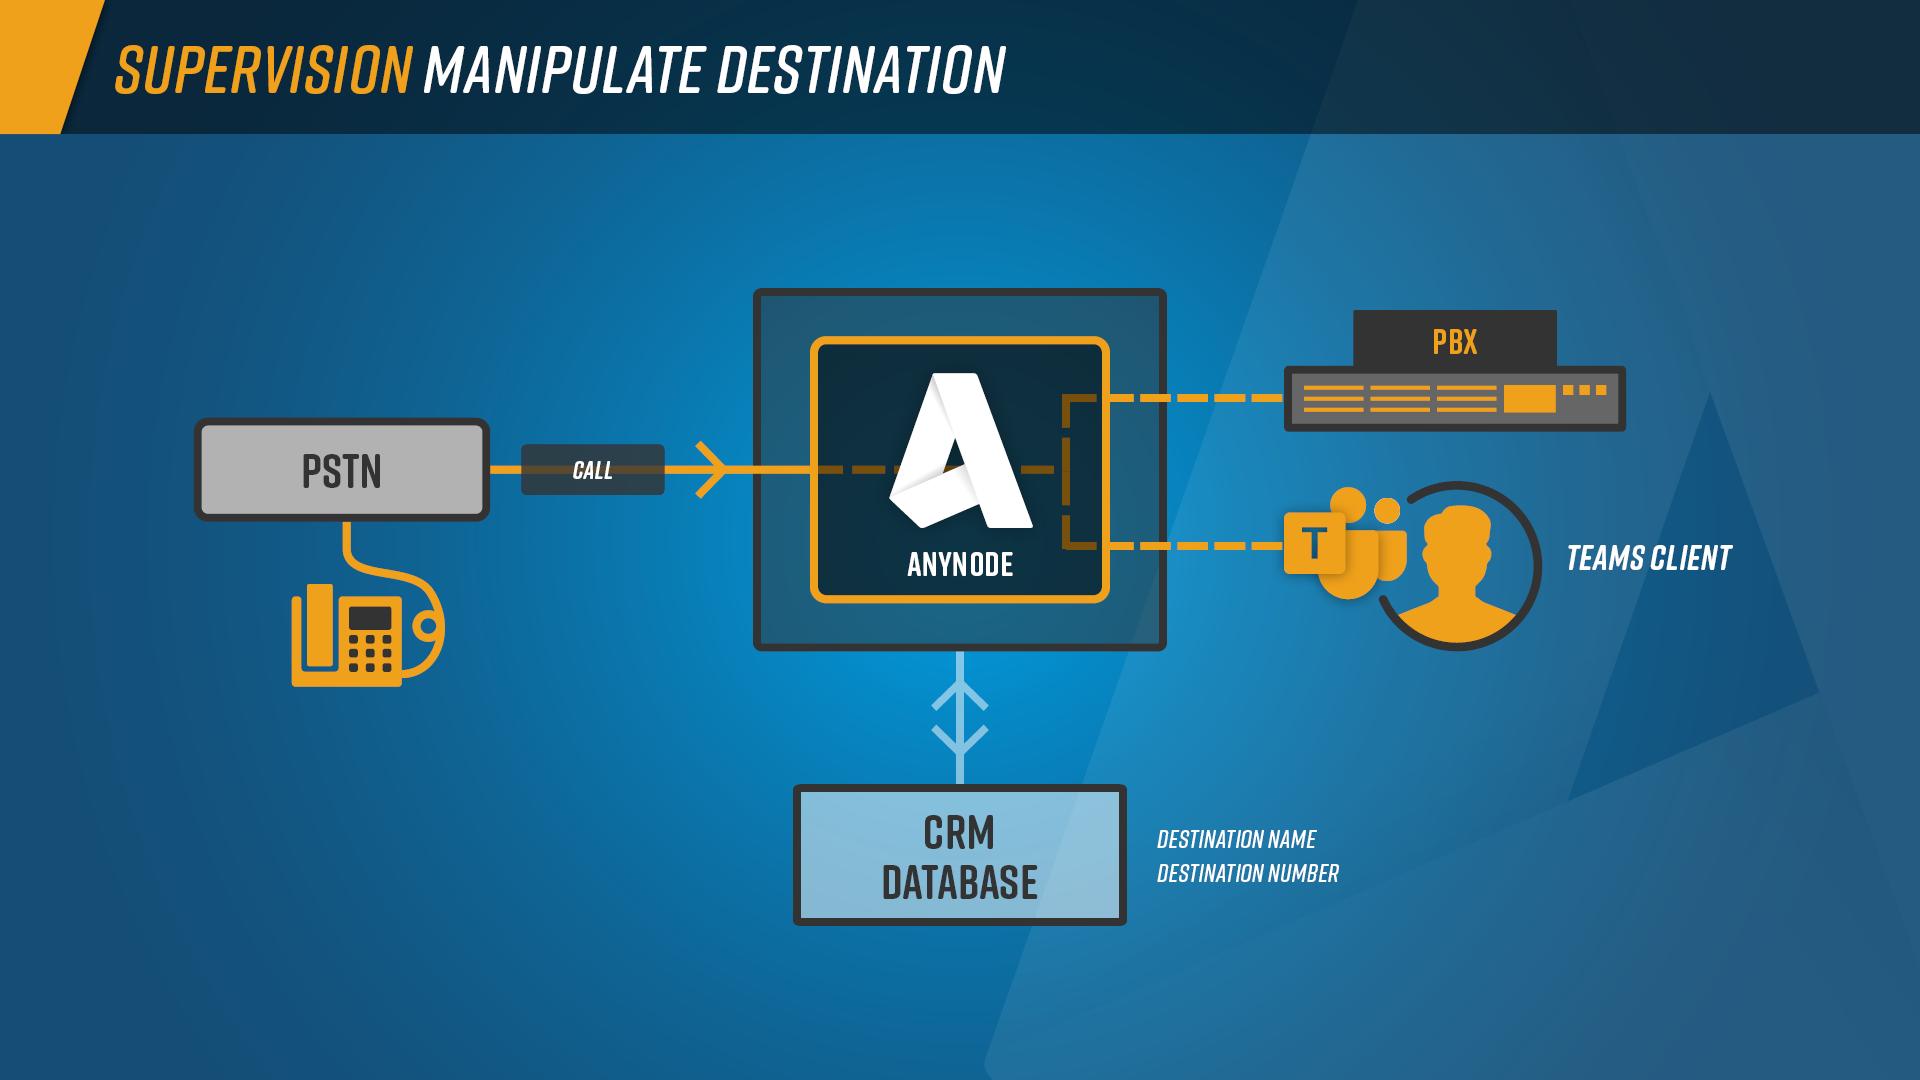 Supervision_Graph_Manipulate_Destination